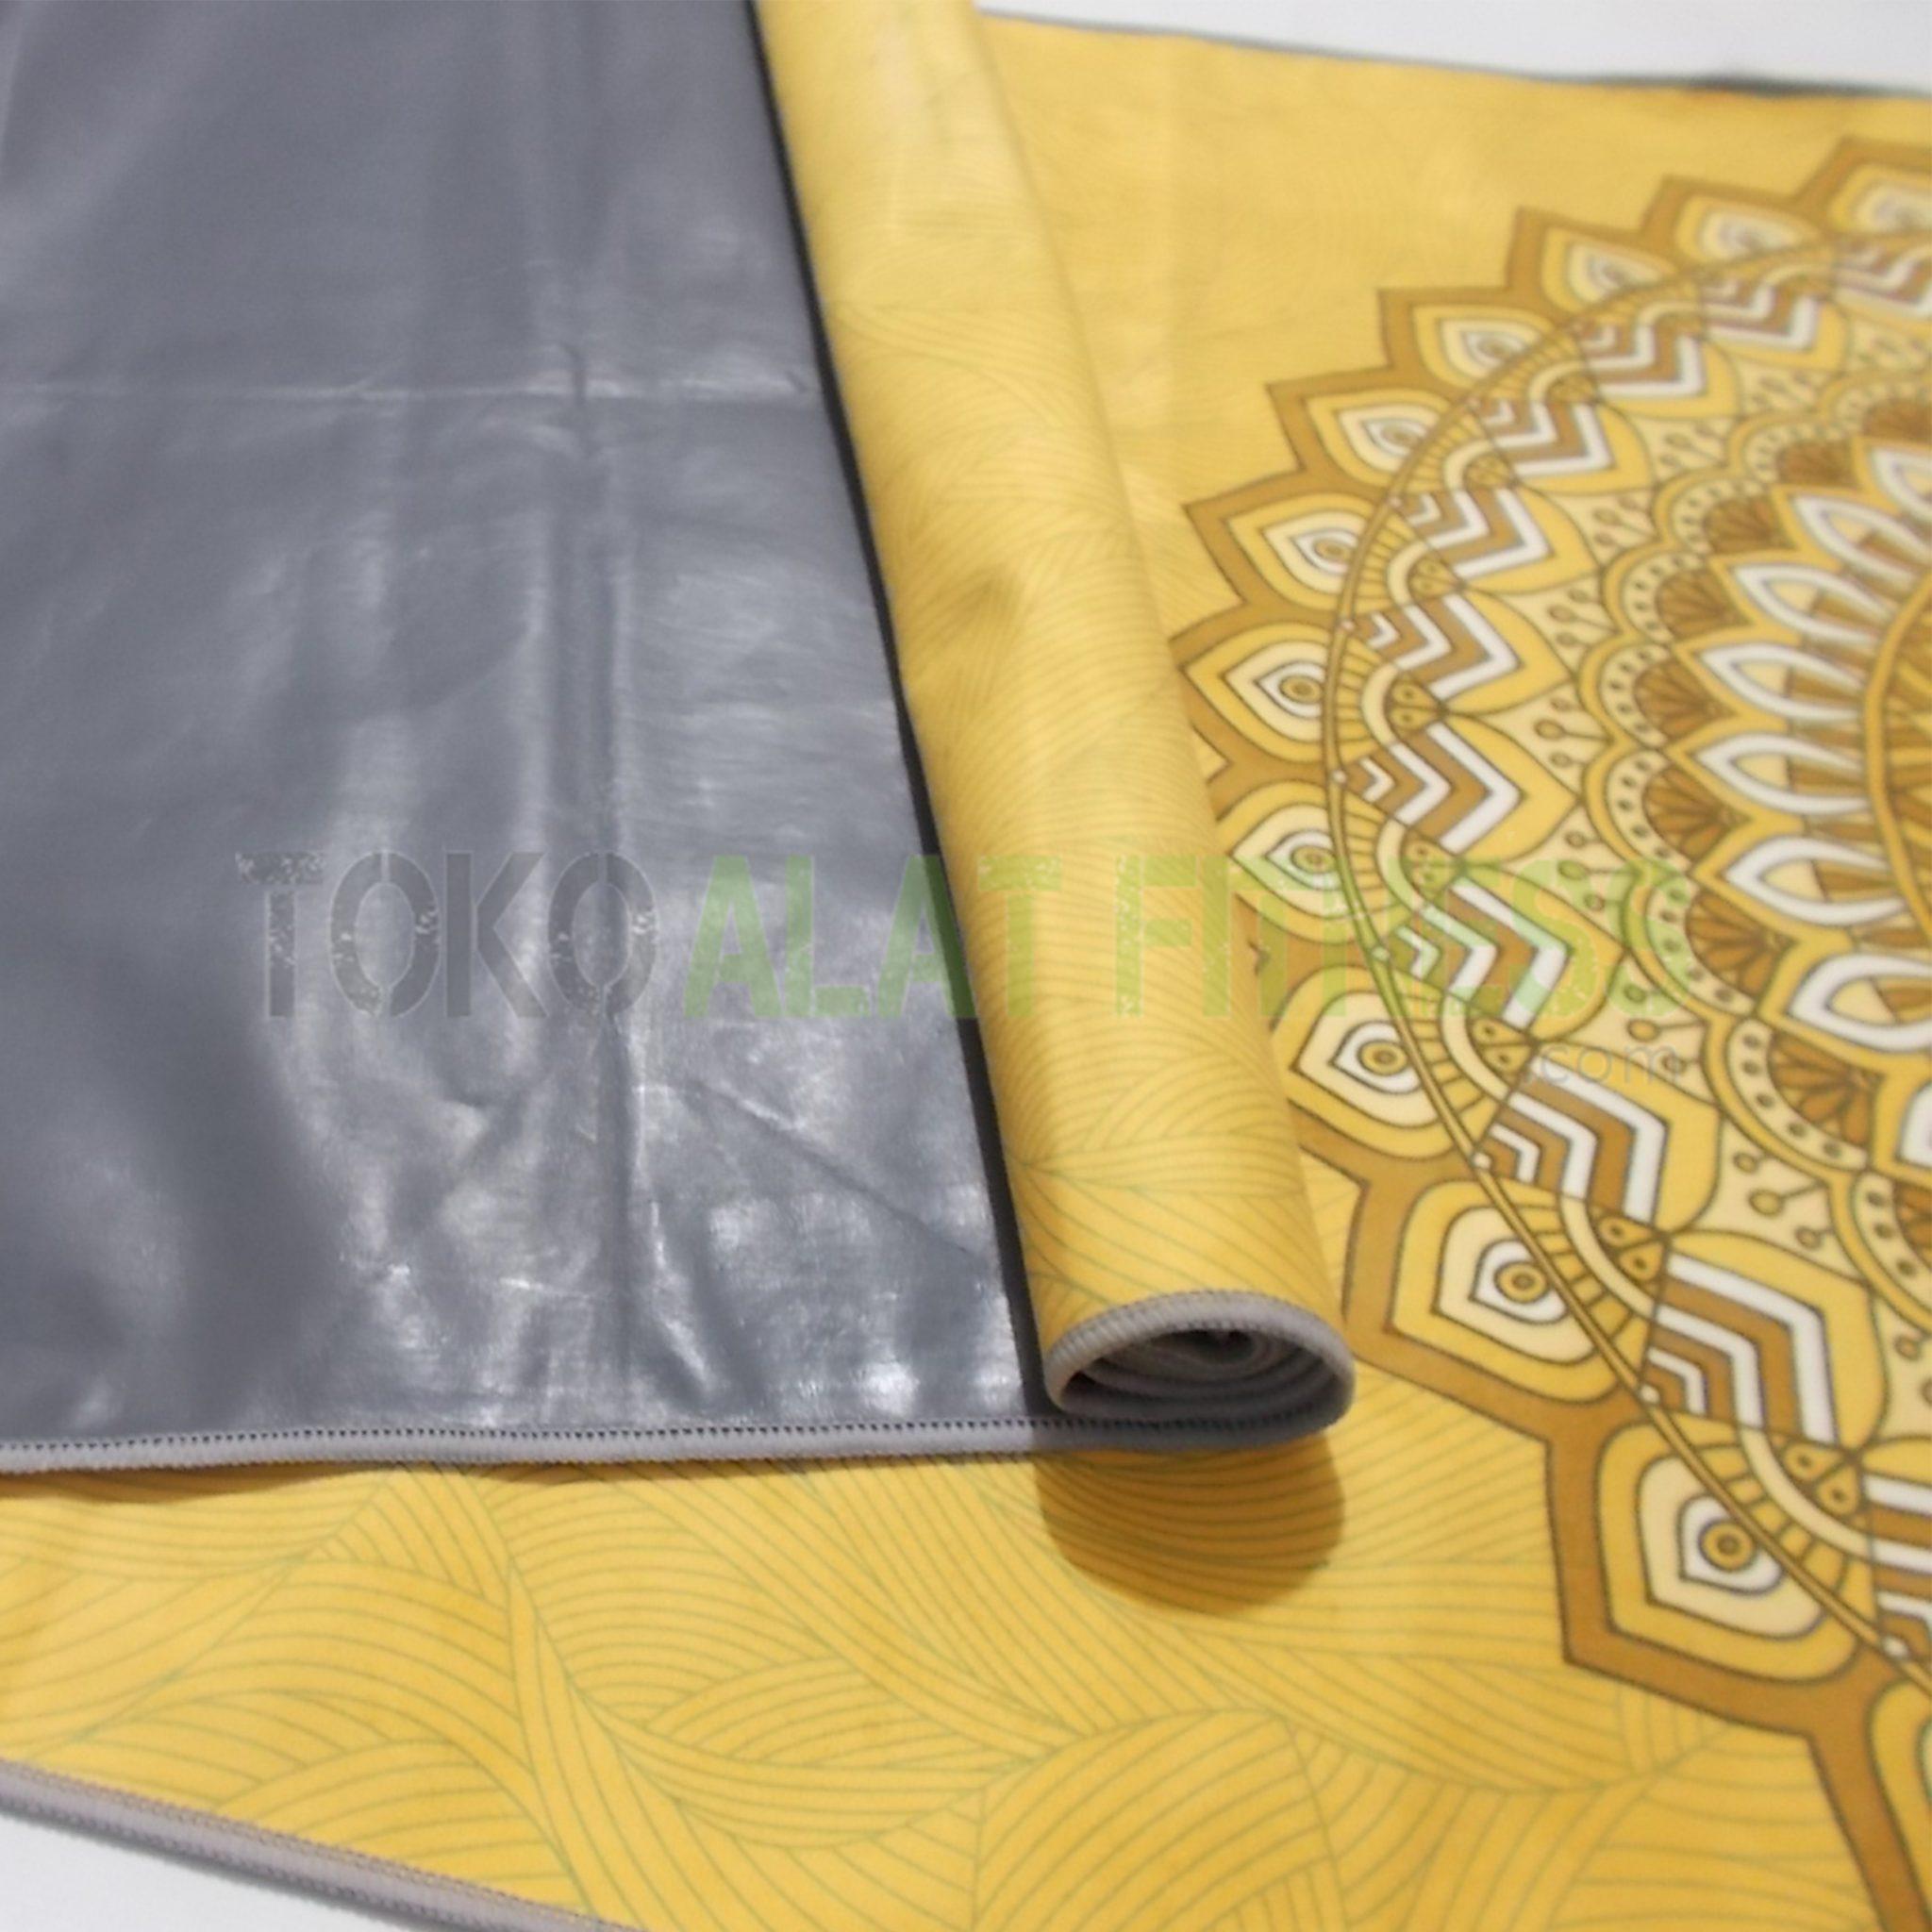 2 wtm - Yoga Mat Rubber Plastik Motif, Kuning  Body Gym